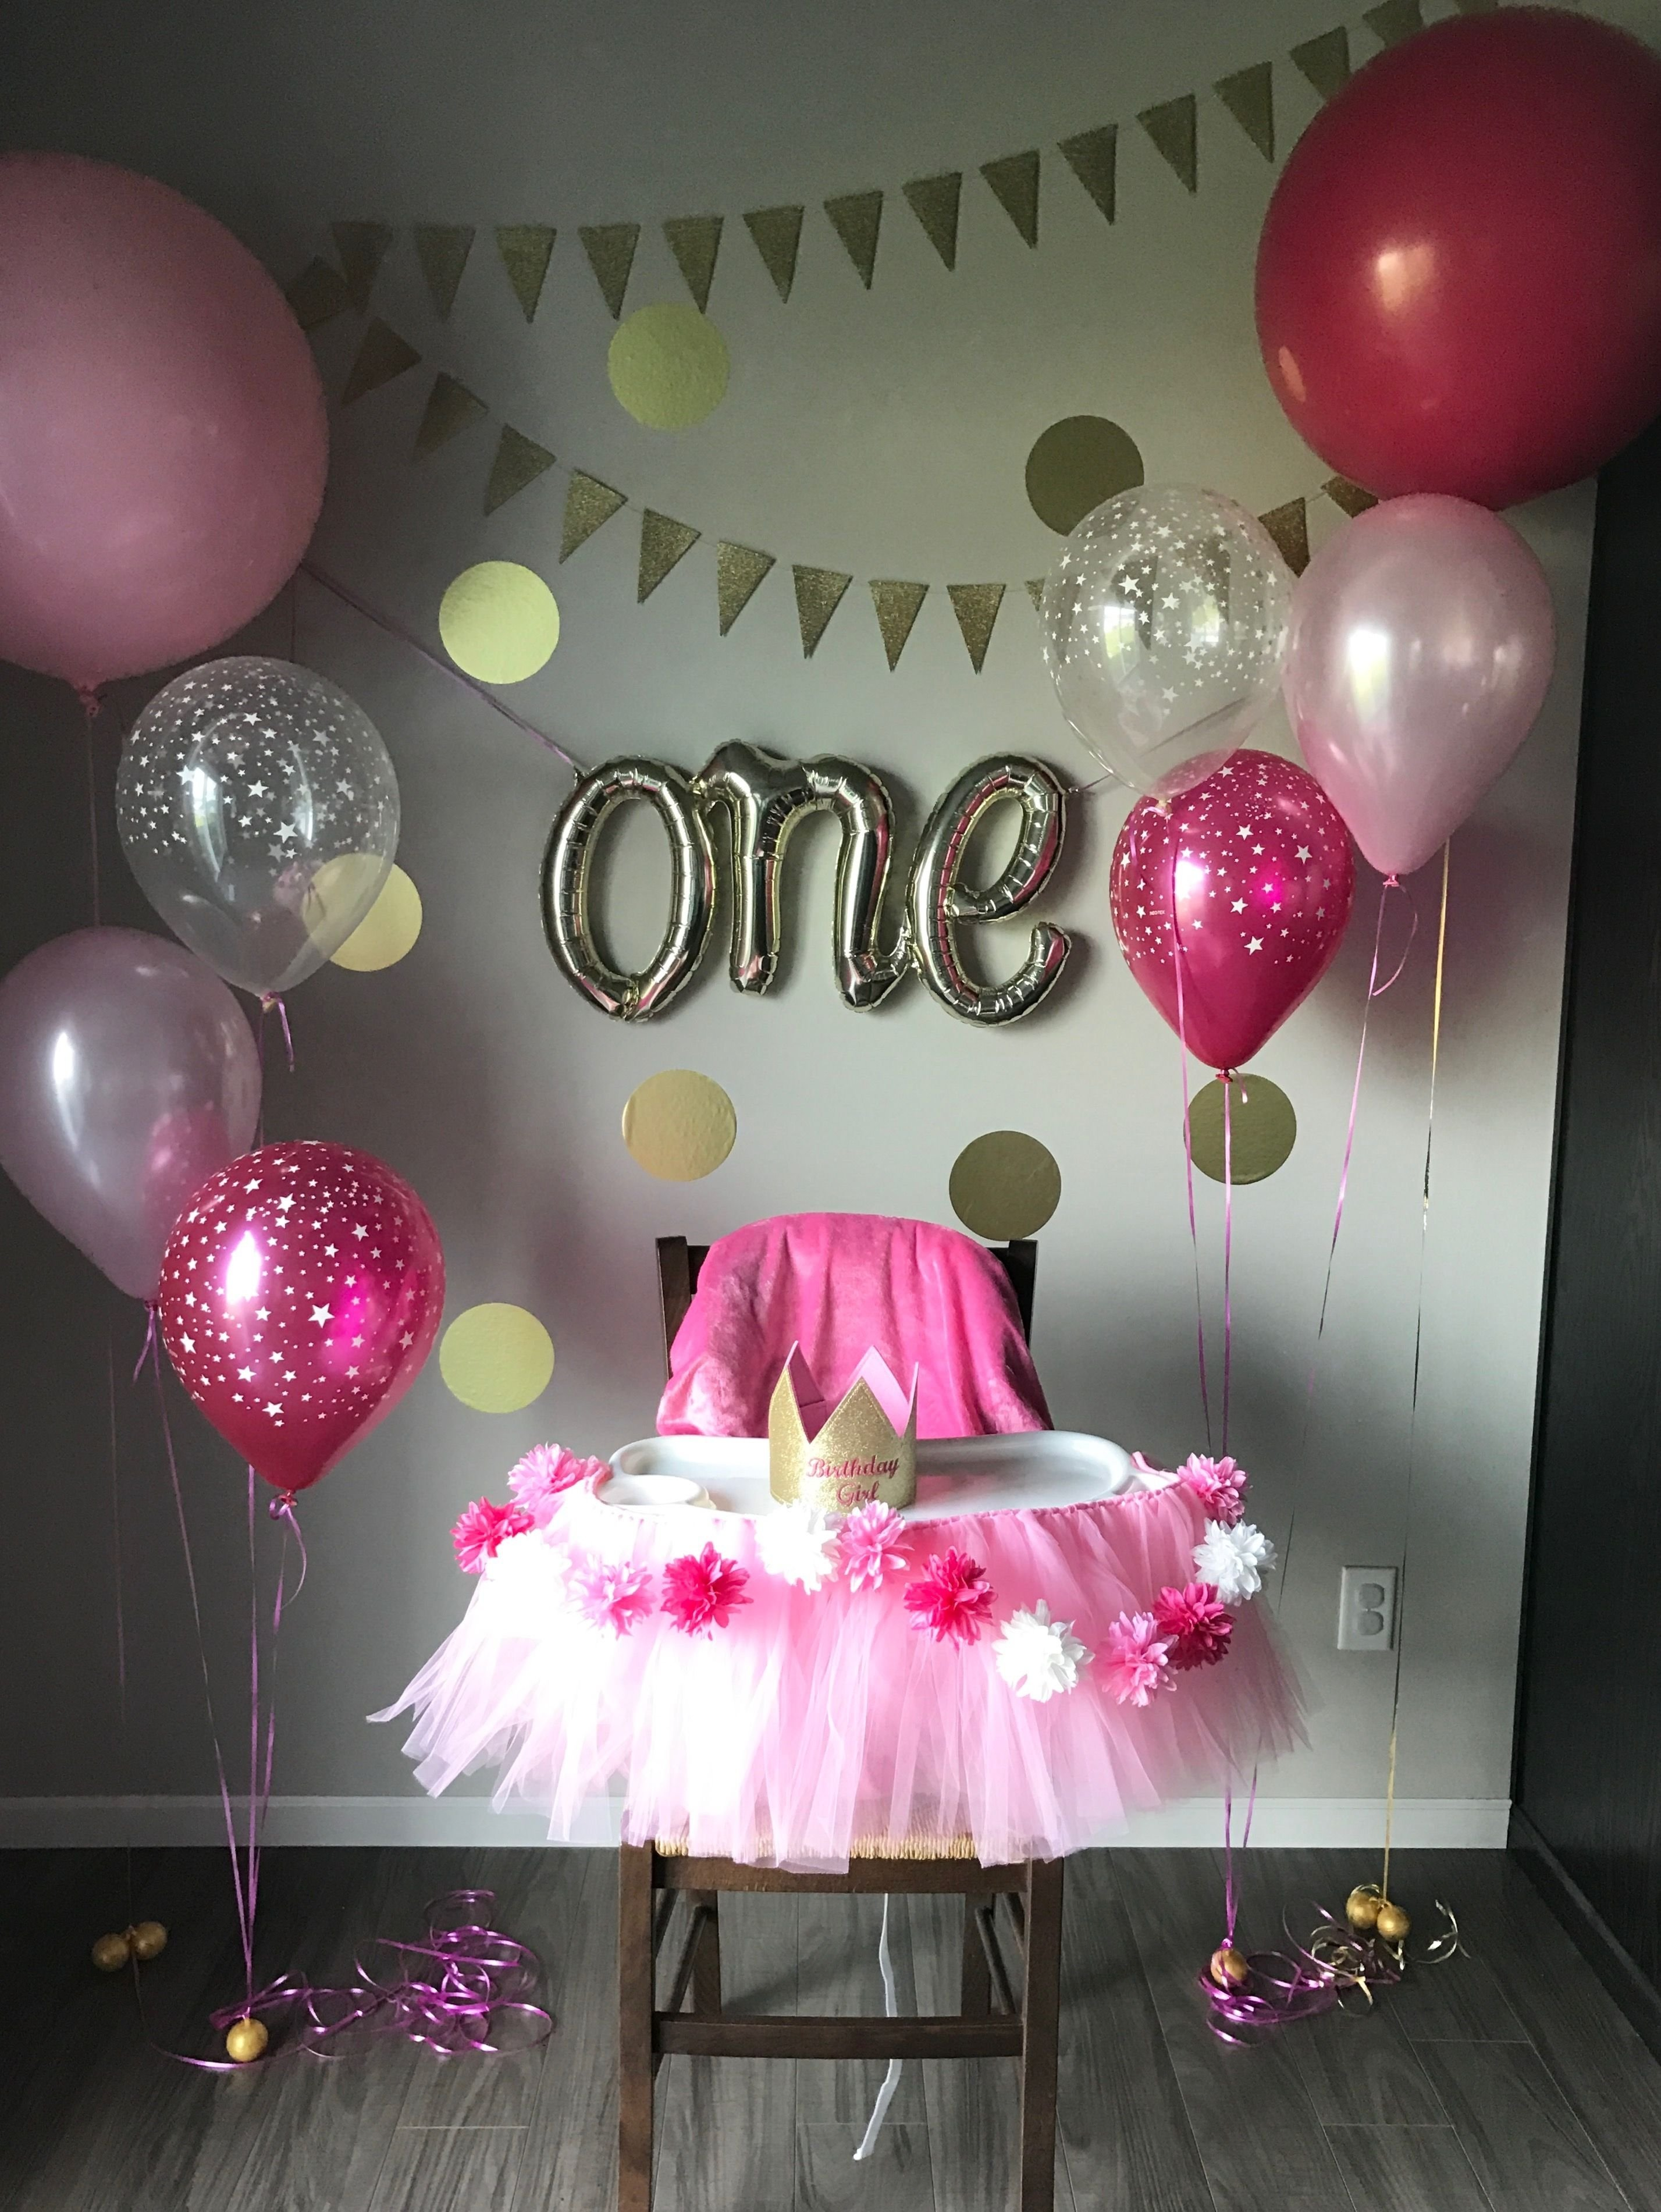 10 Most Popular Birthday Party Ideas Richmond Va first birthday party pinteres 8 2021